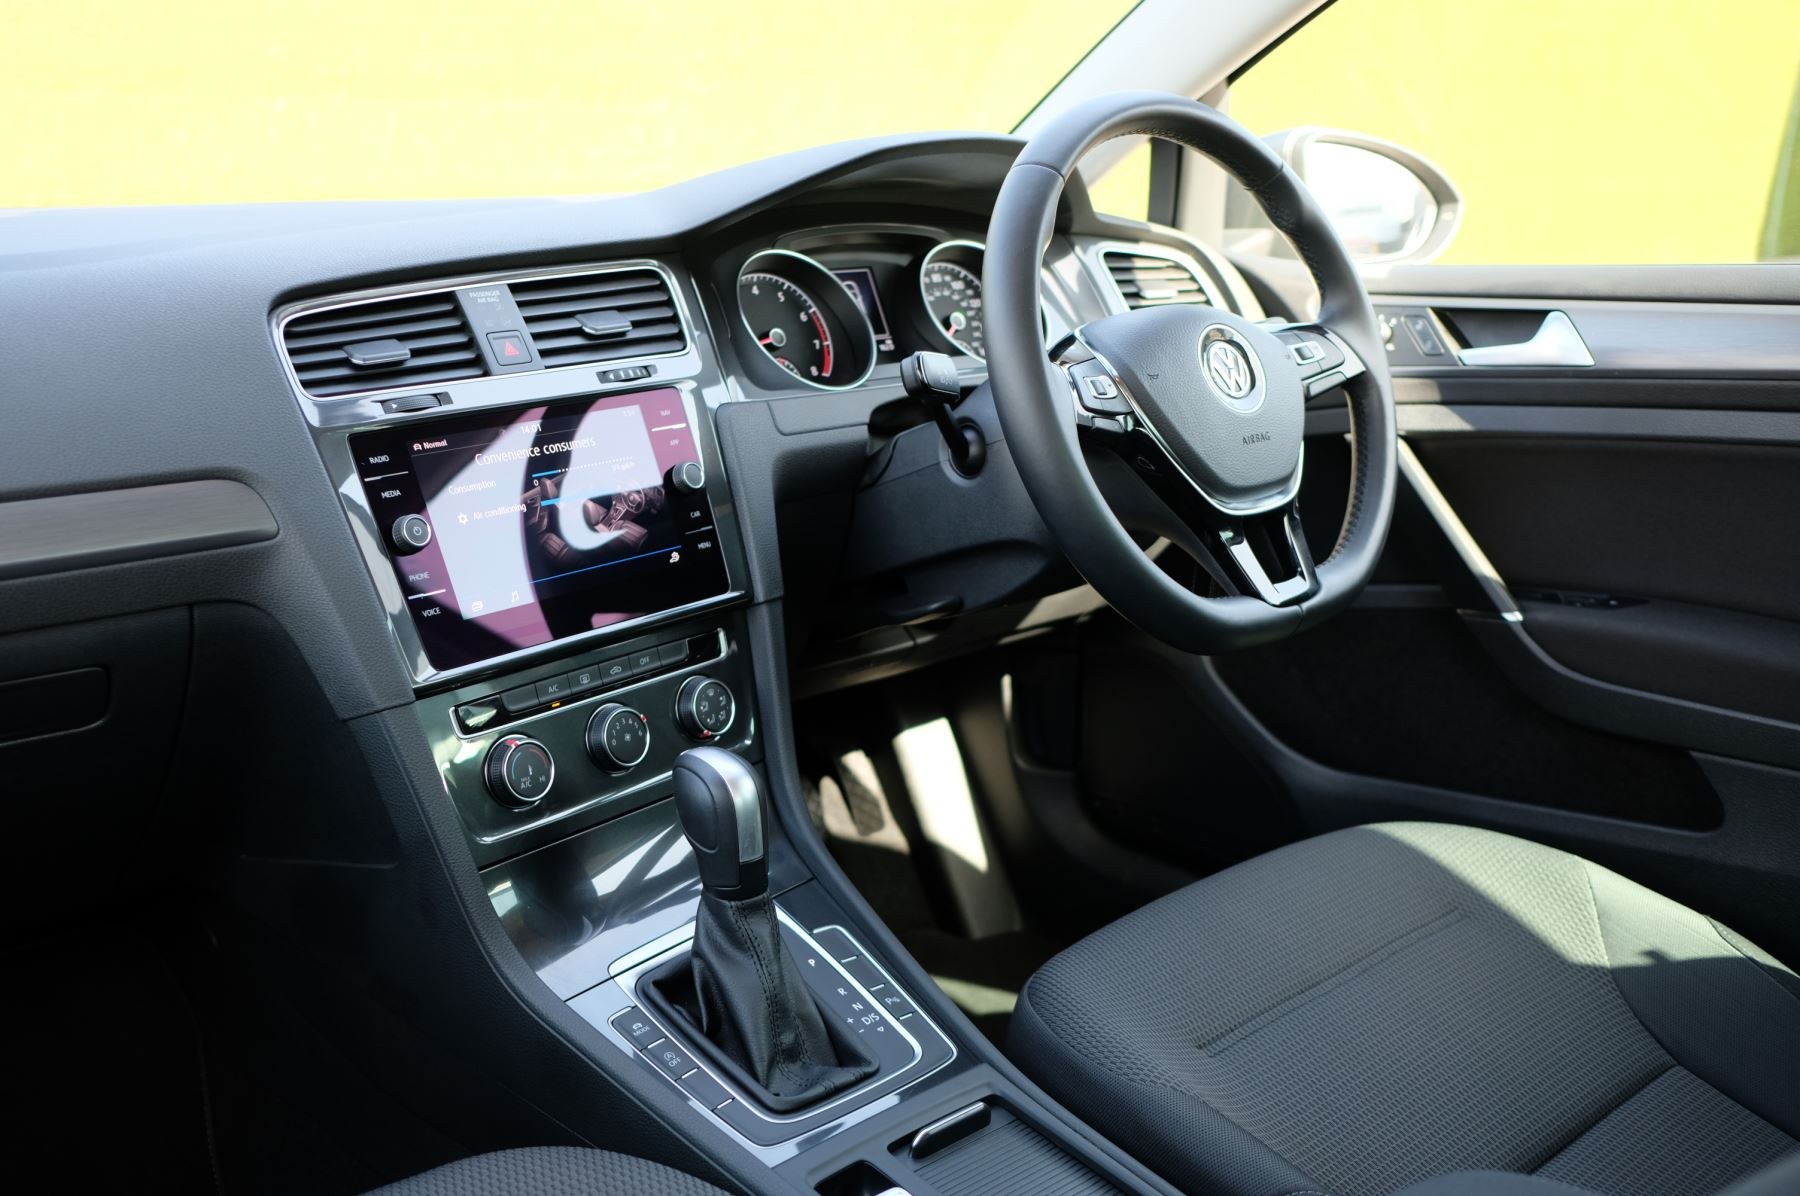 Volkswagen Golf 1.5 TSI EVO 150hp Match 5 Door DSG Auto with A/Con, Sat Nav, Alloys & Adaptive Cruise  image 14